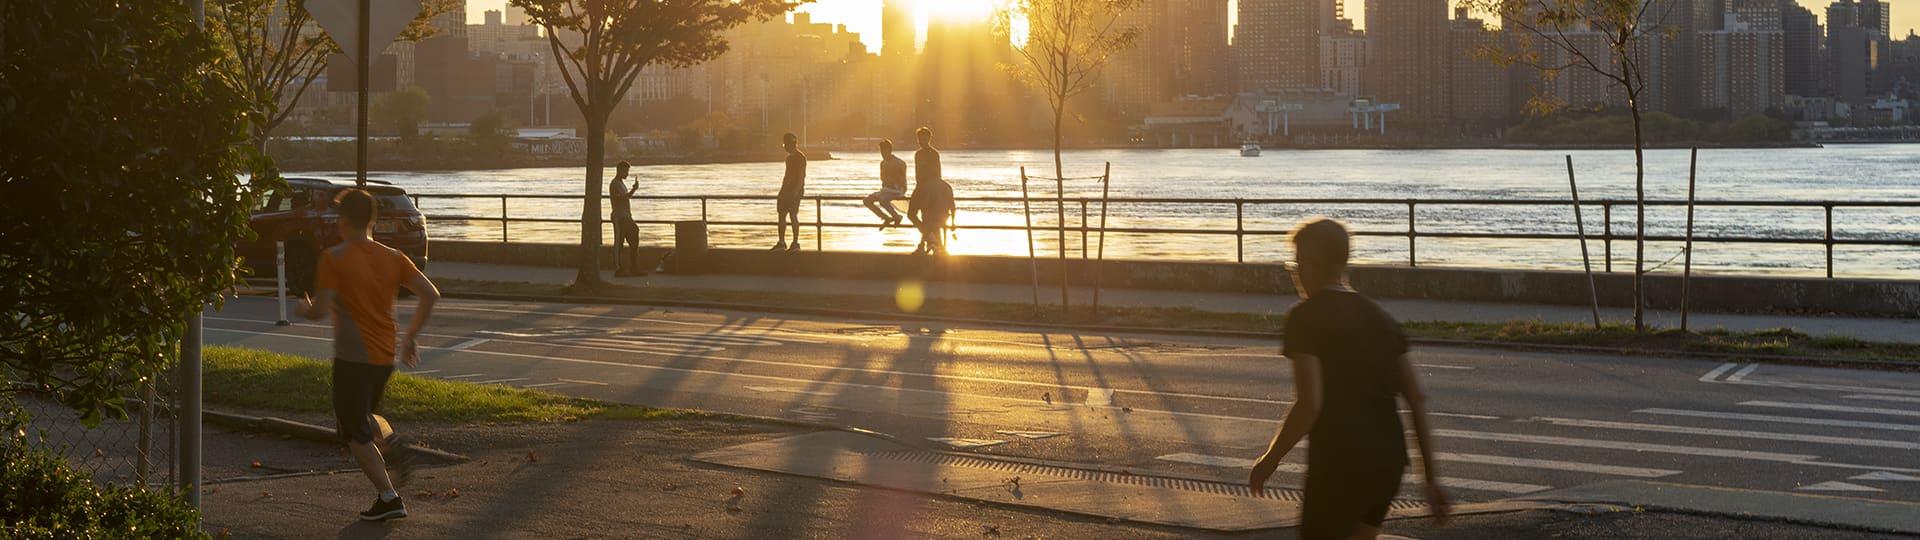 Astoria Park, Queens